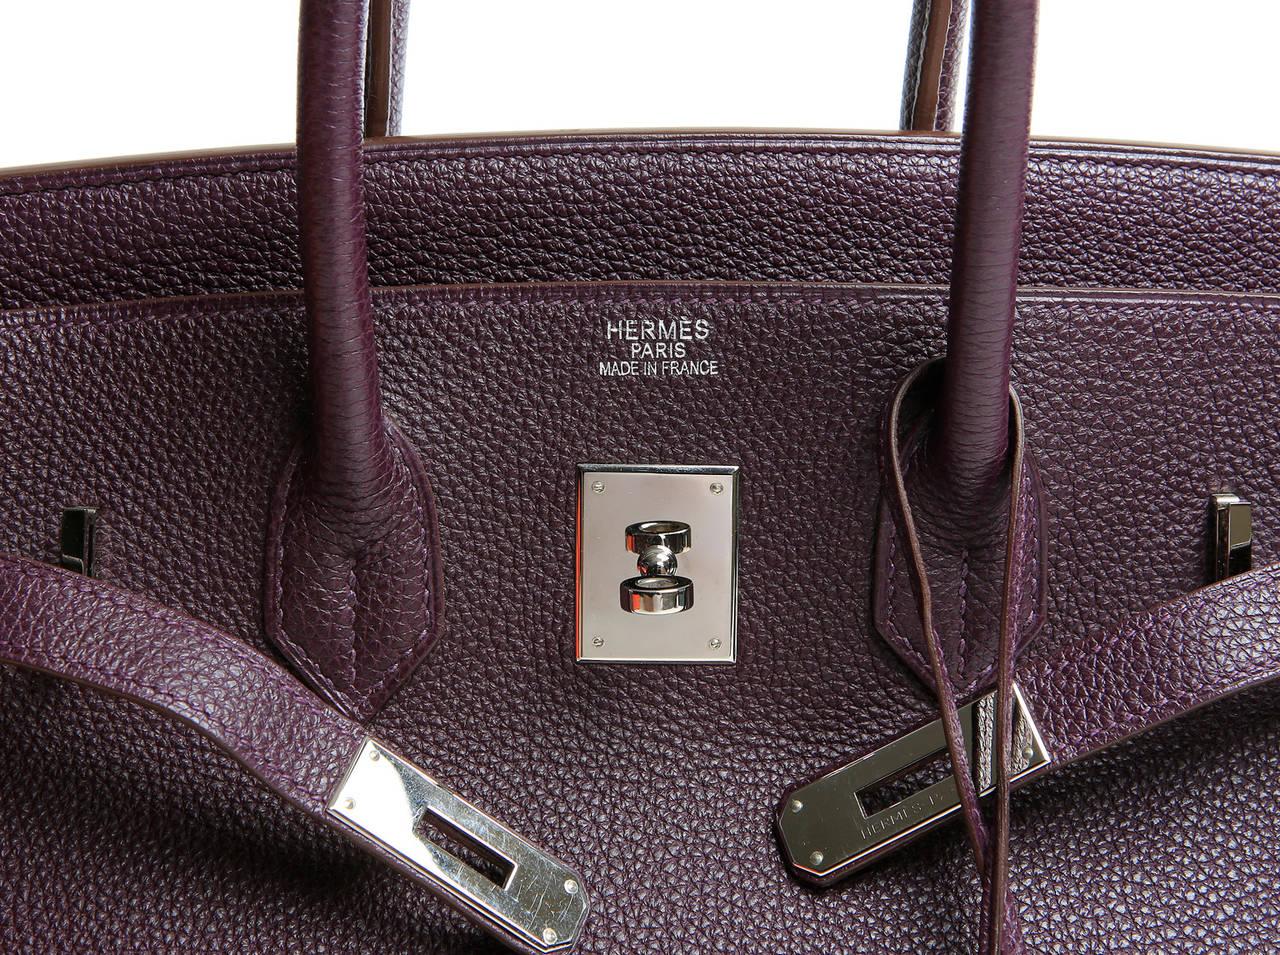 Hermes Togo Leather RAISIN Purple Birkin Bag 35 cm at 1stdibs